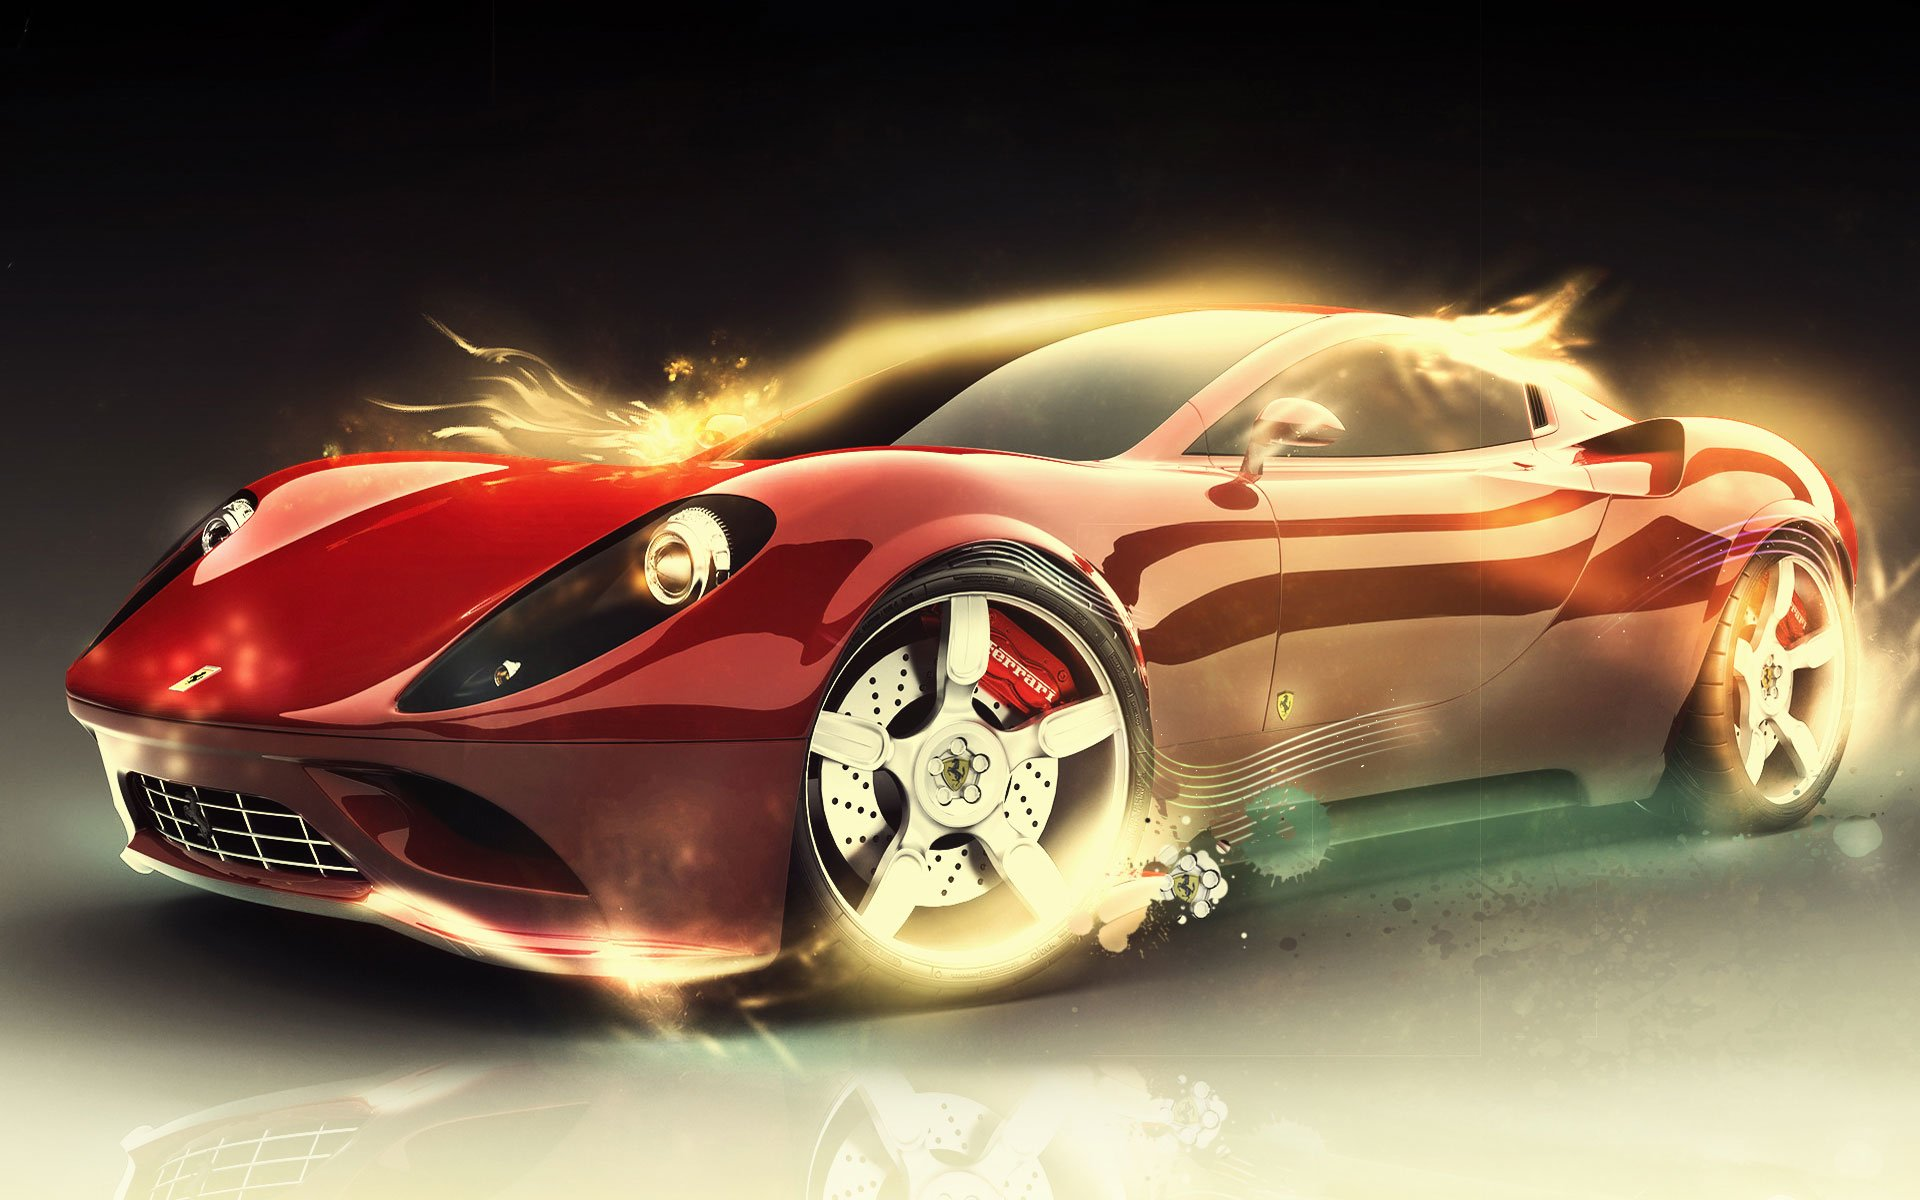 Ferrari Car Wallpaper For Laptop